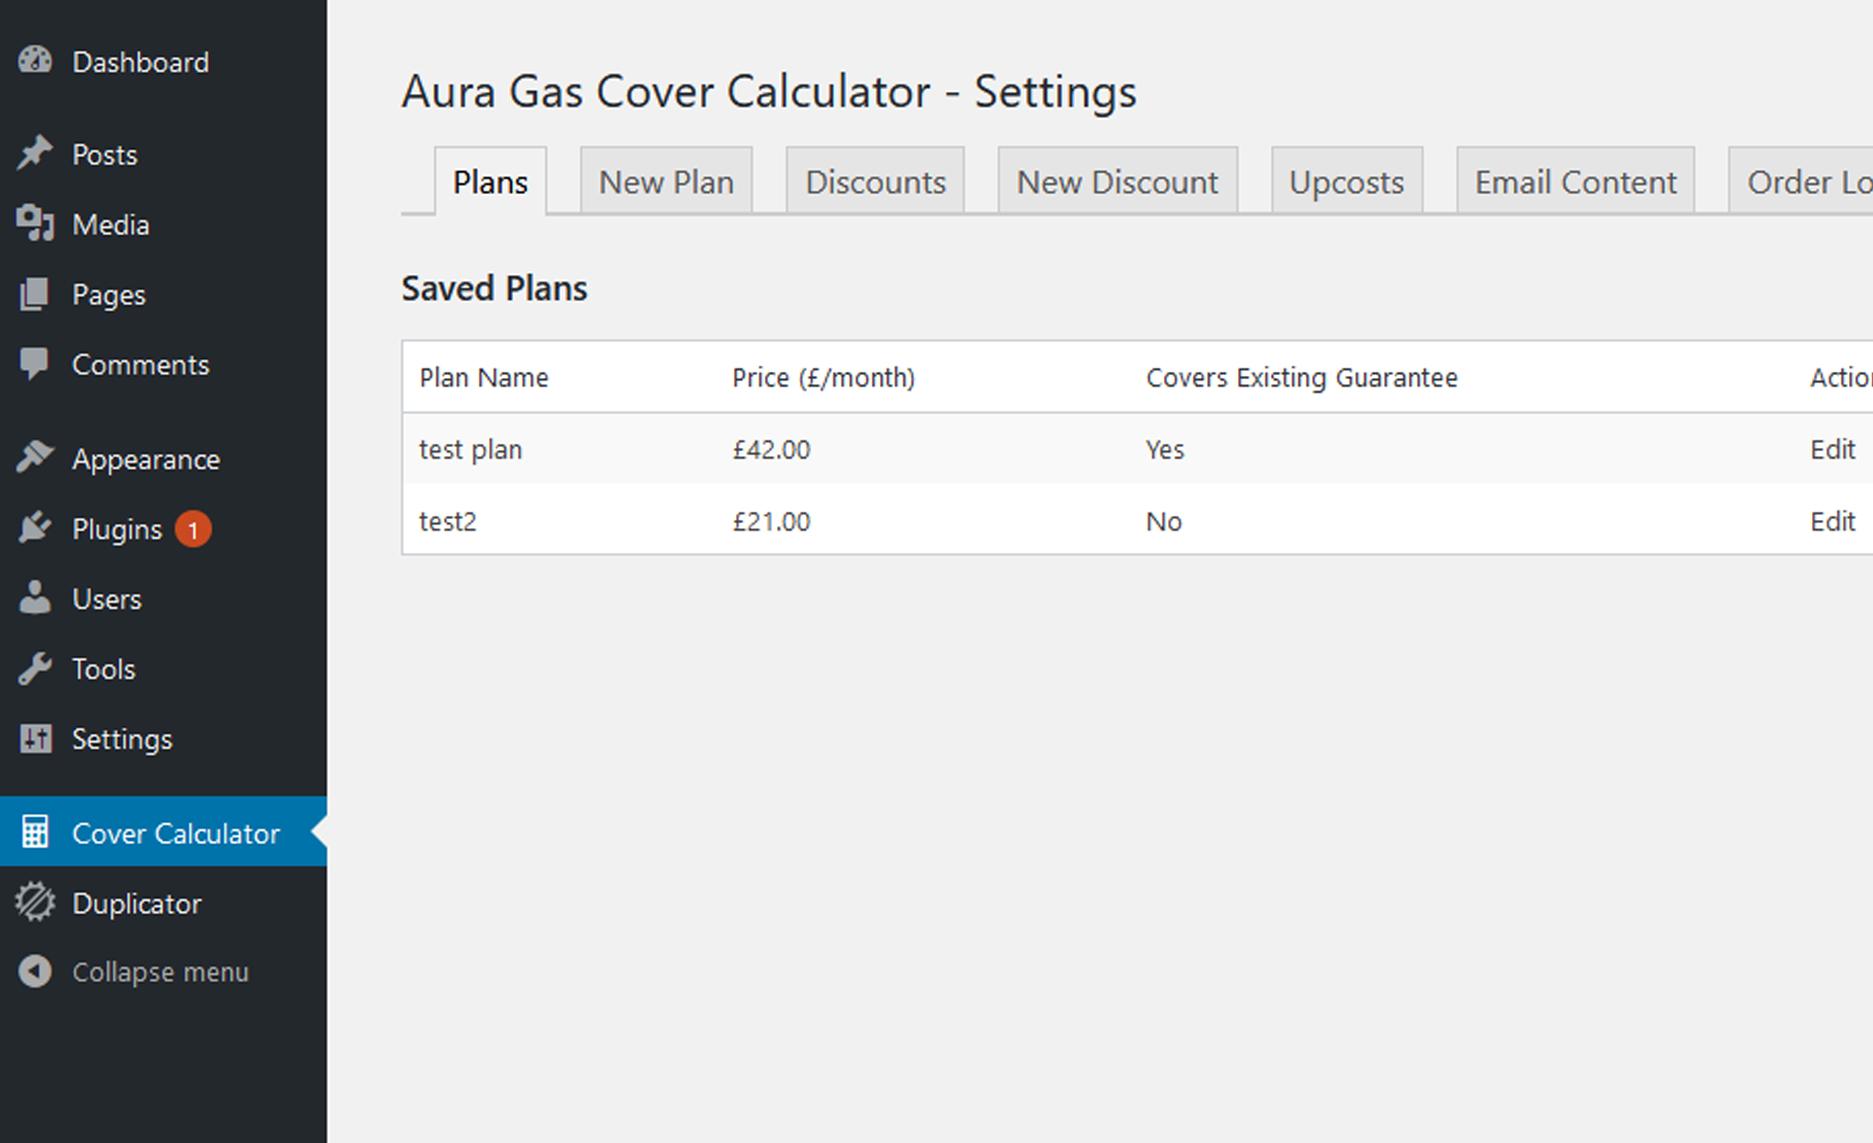 Aura gas Cover Calculator